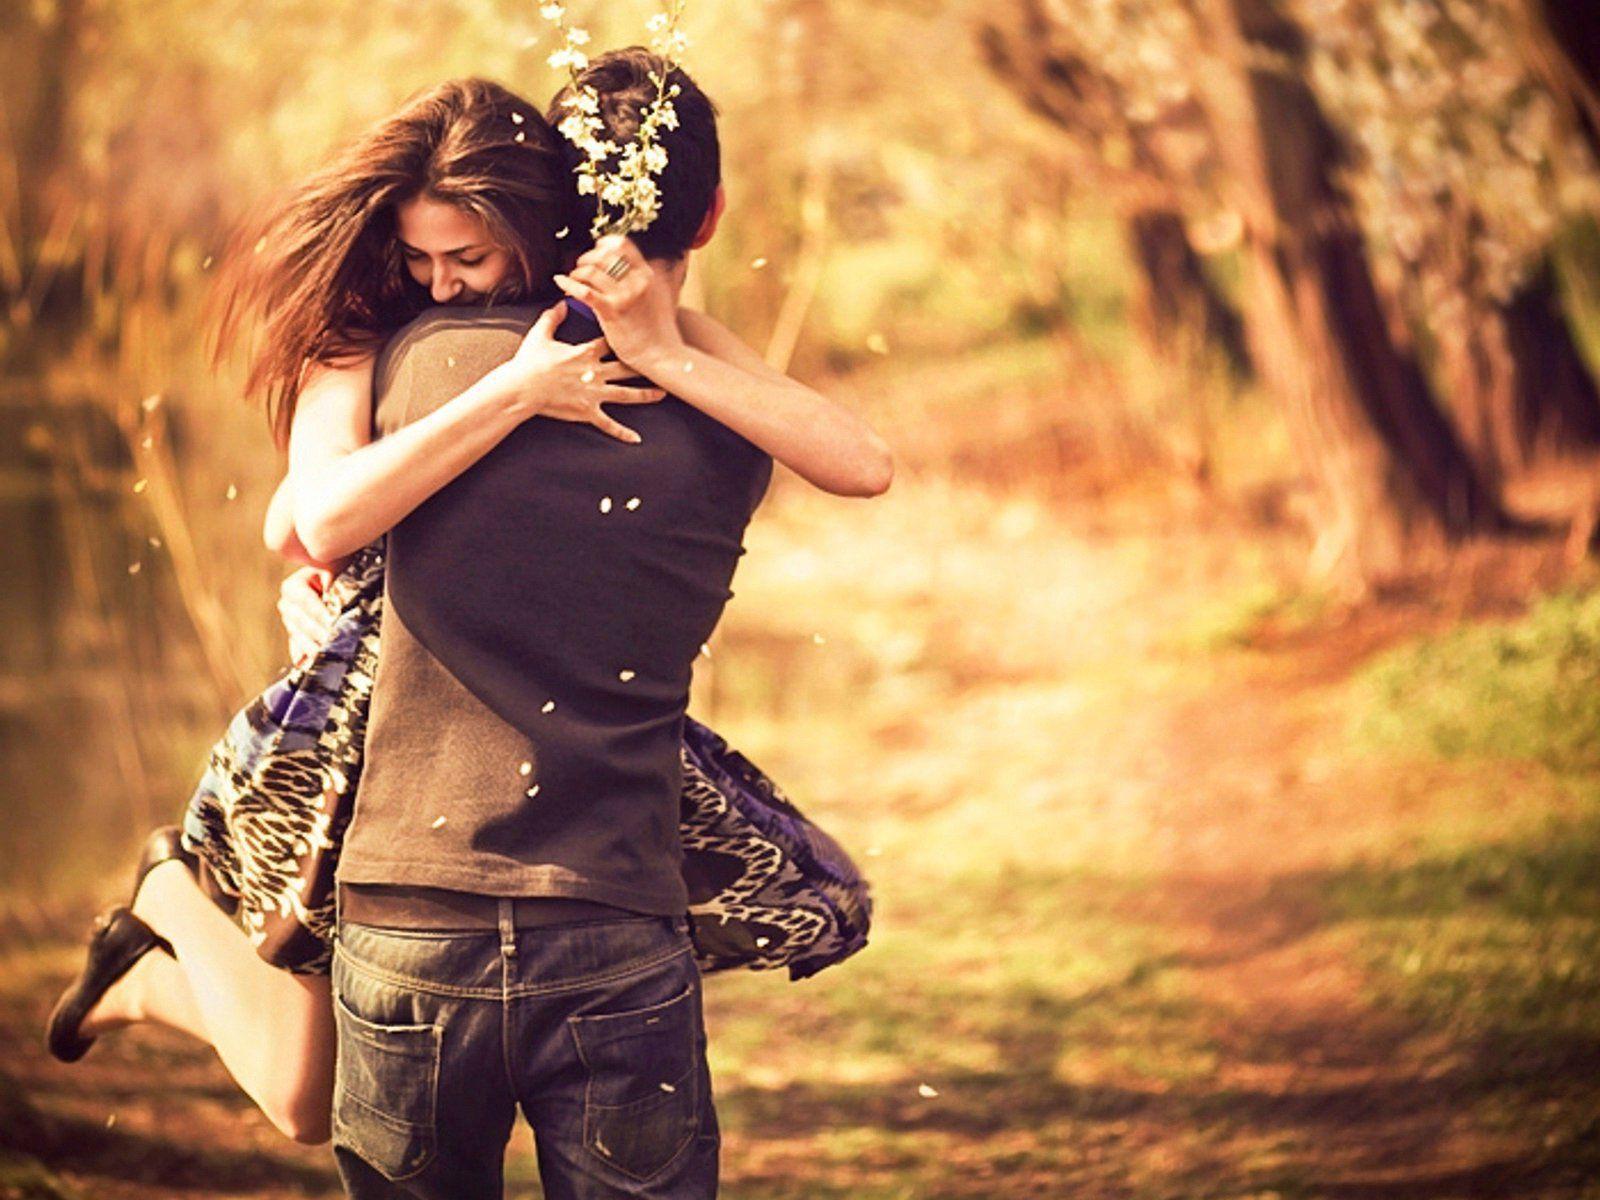 Boy & Girl Love Wallpapers - Wallpaper Cave